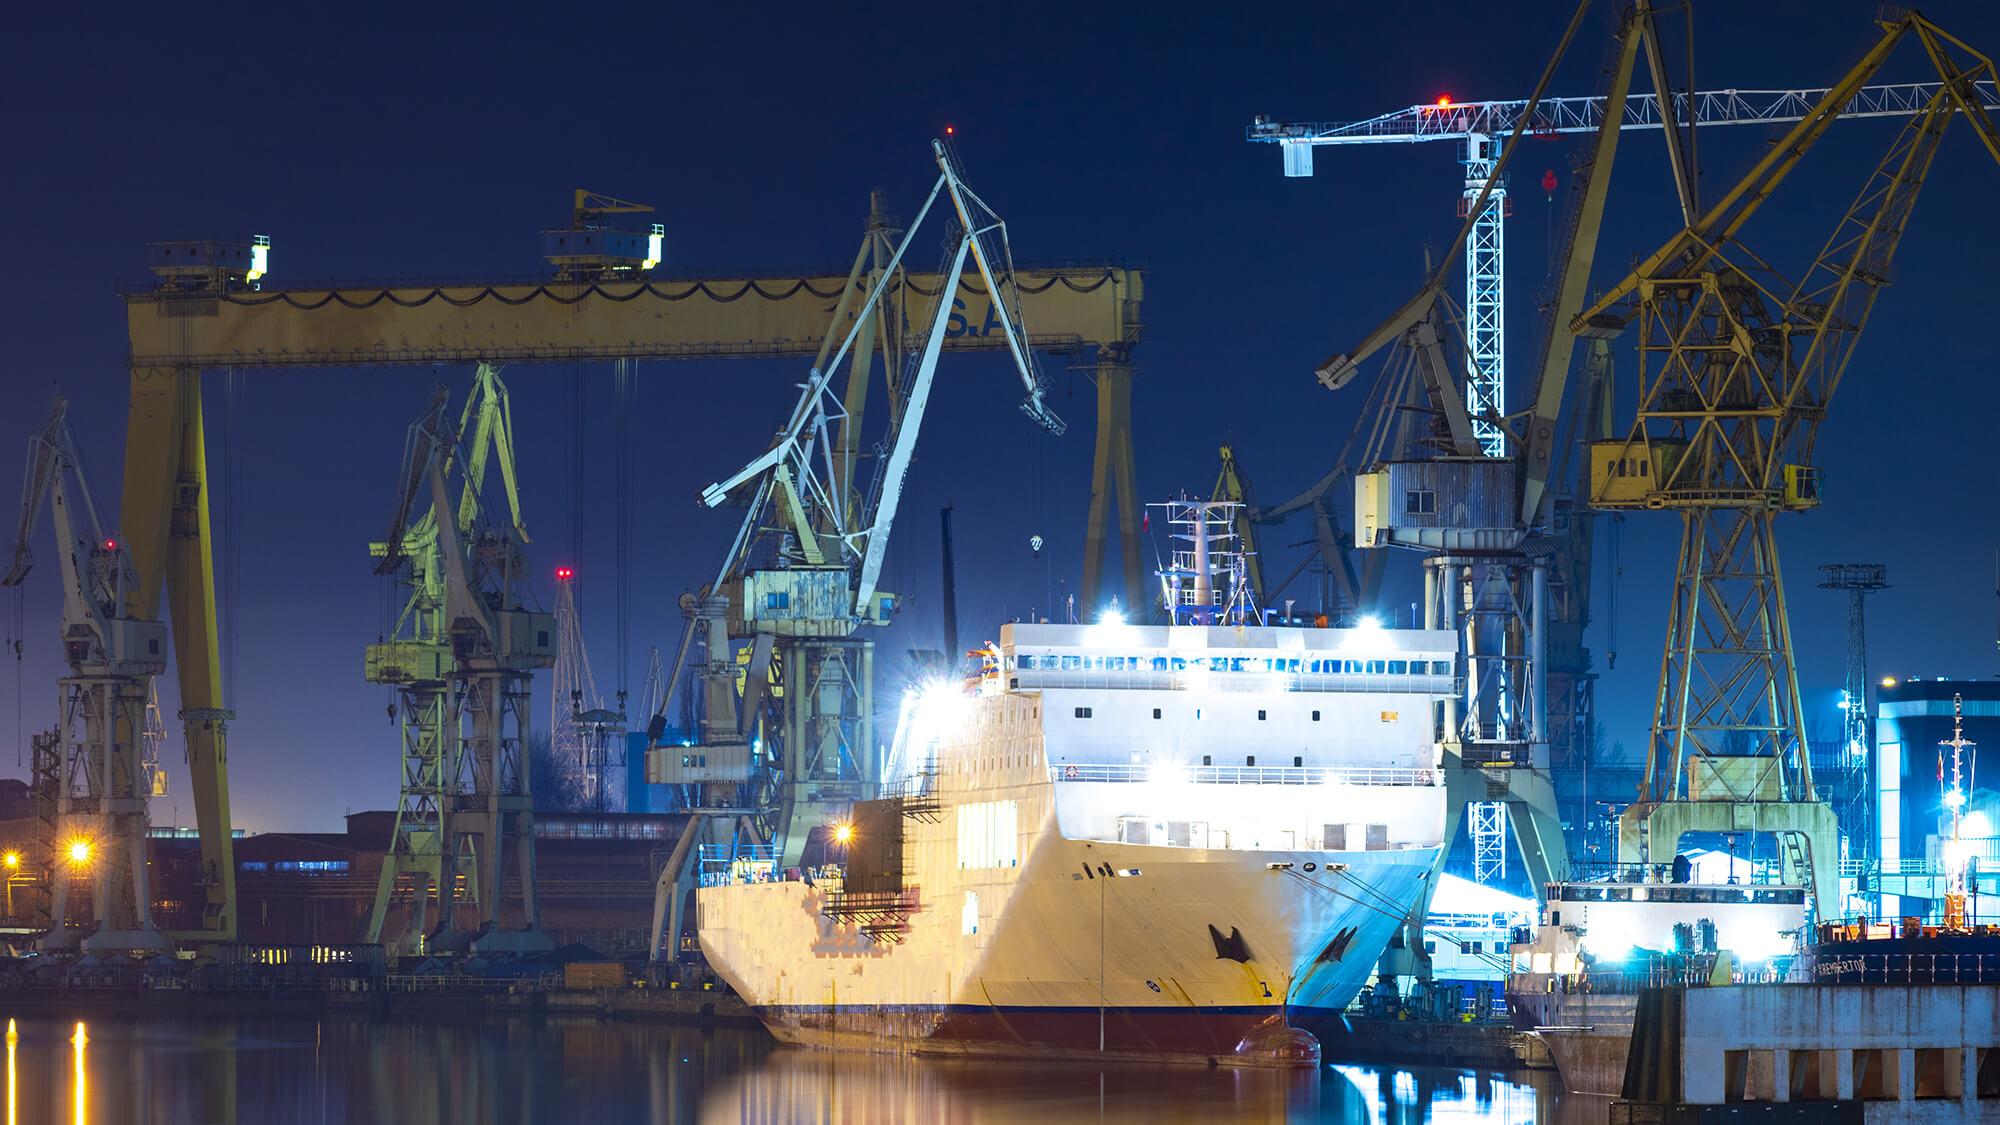 an industrial port